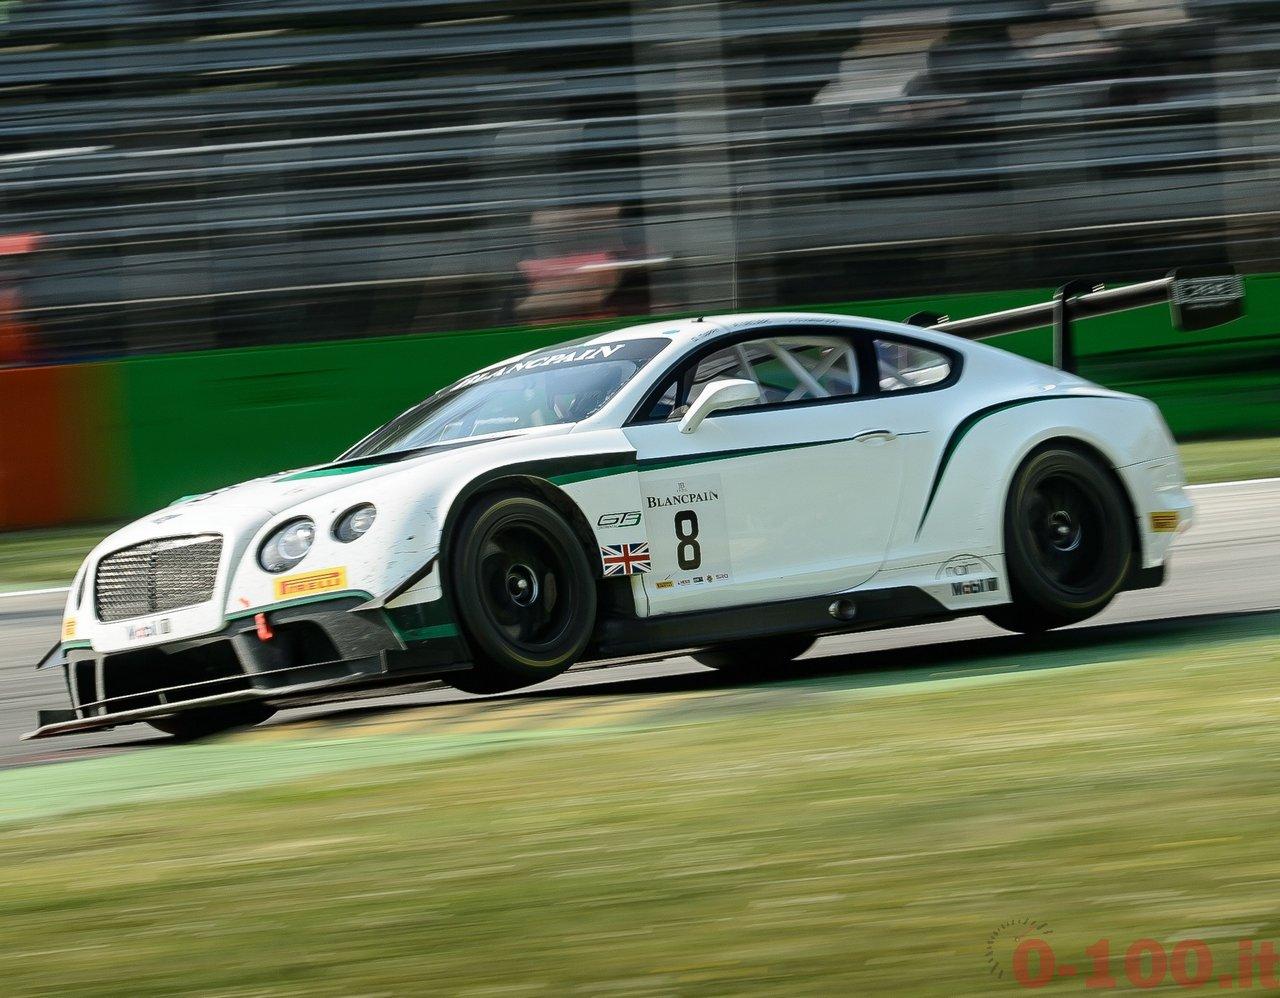 Blancpain-Endurance-Series_bentley-continental-gt3-silverstone-0-100-3